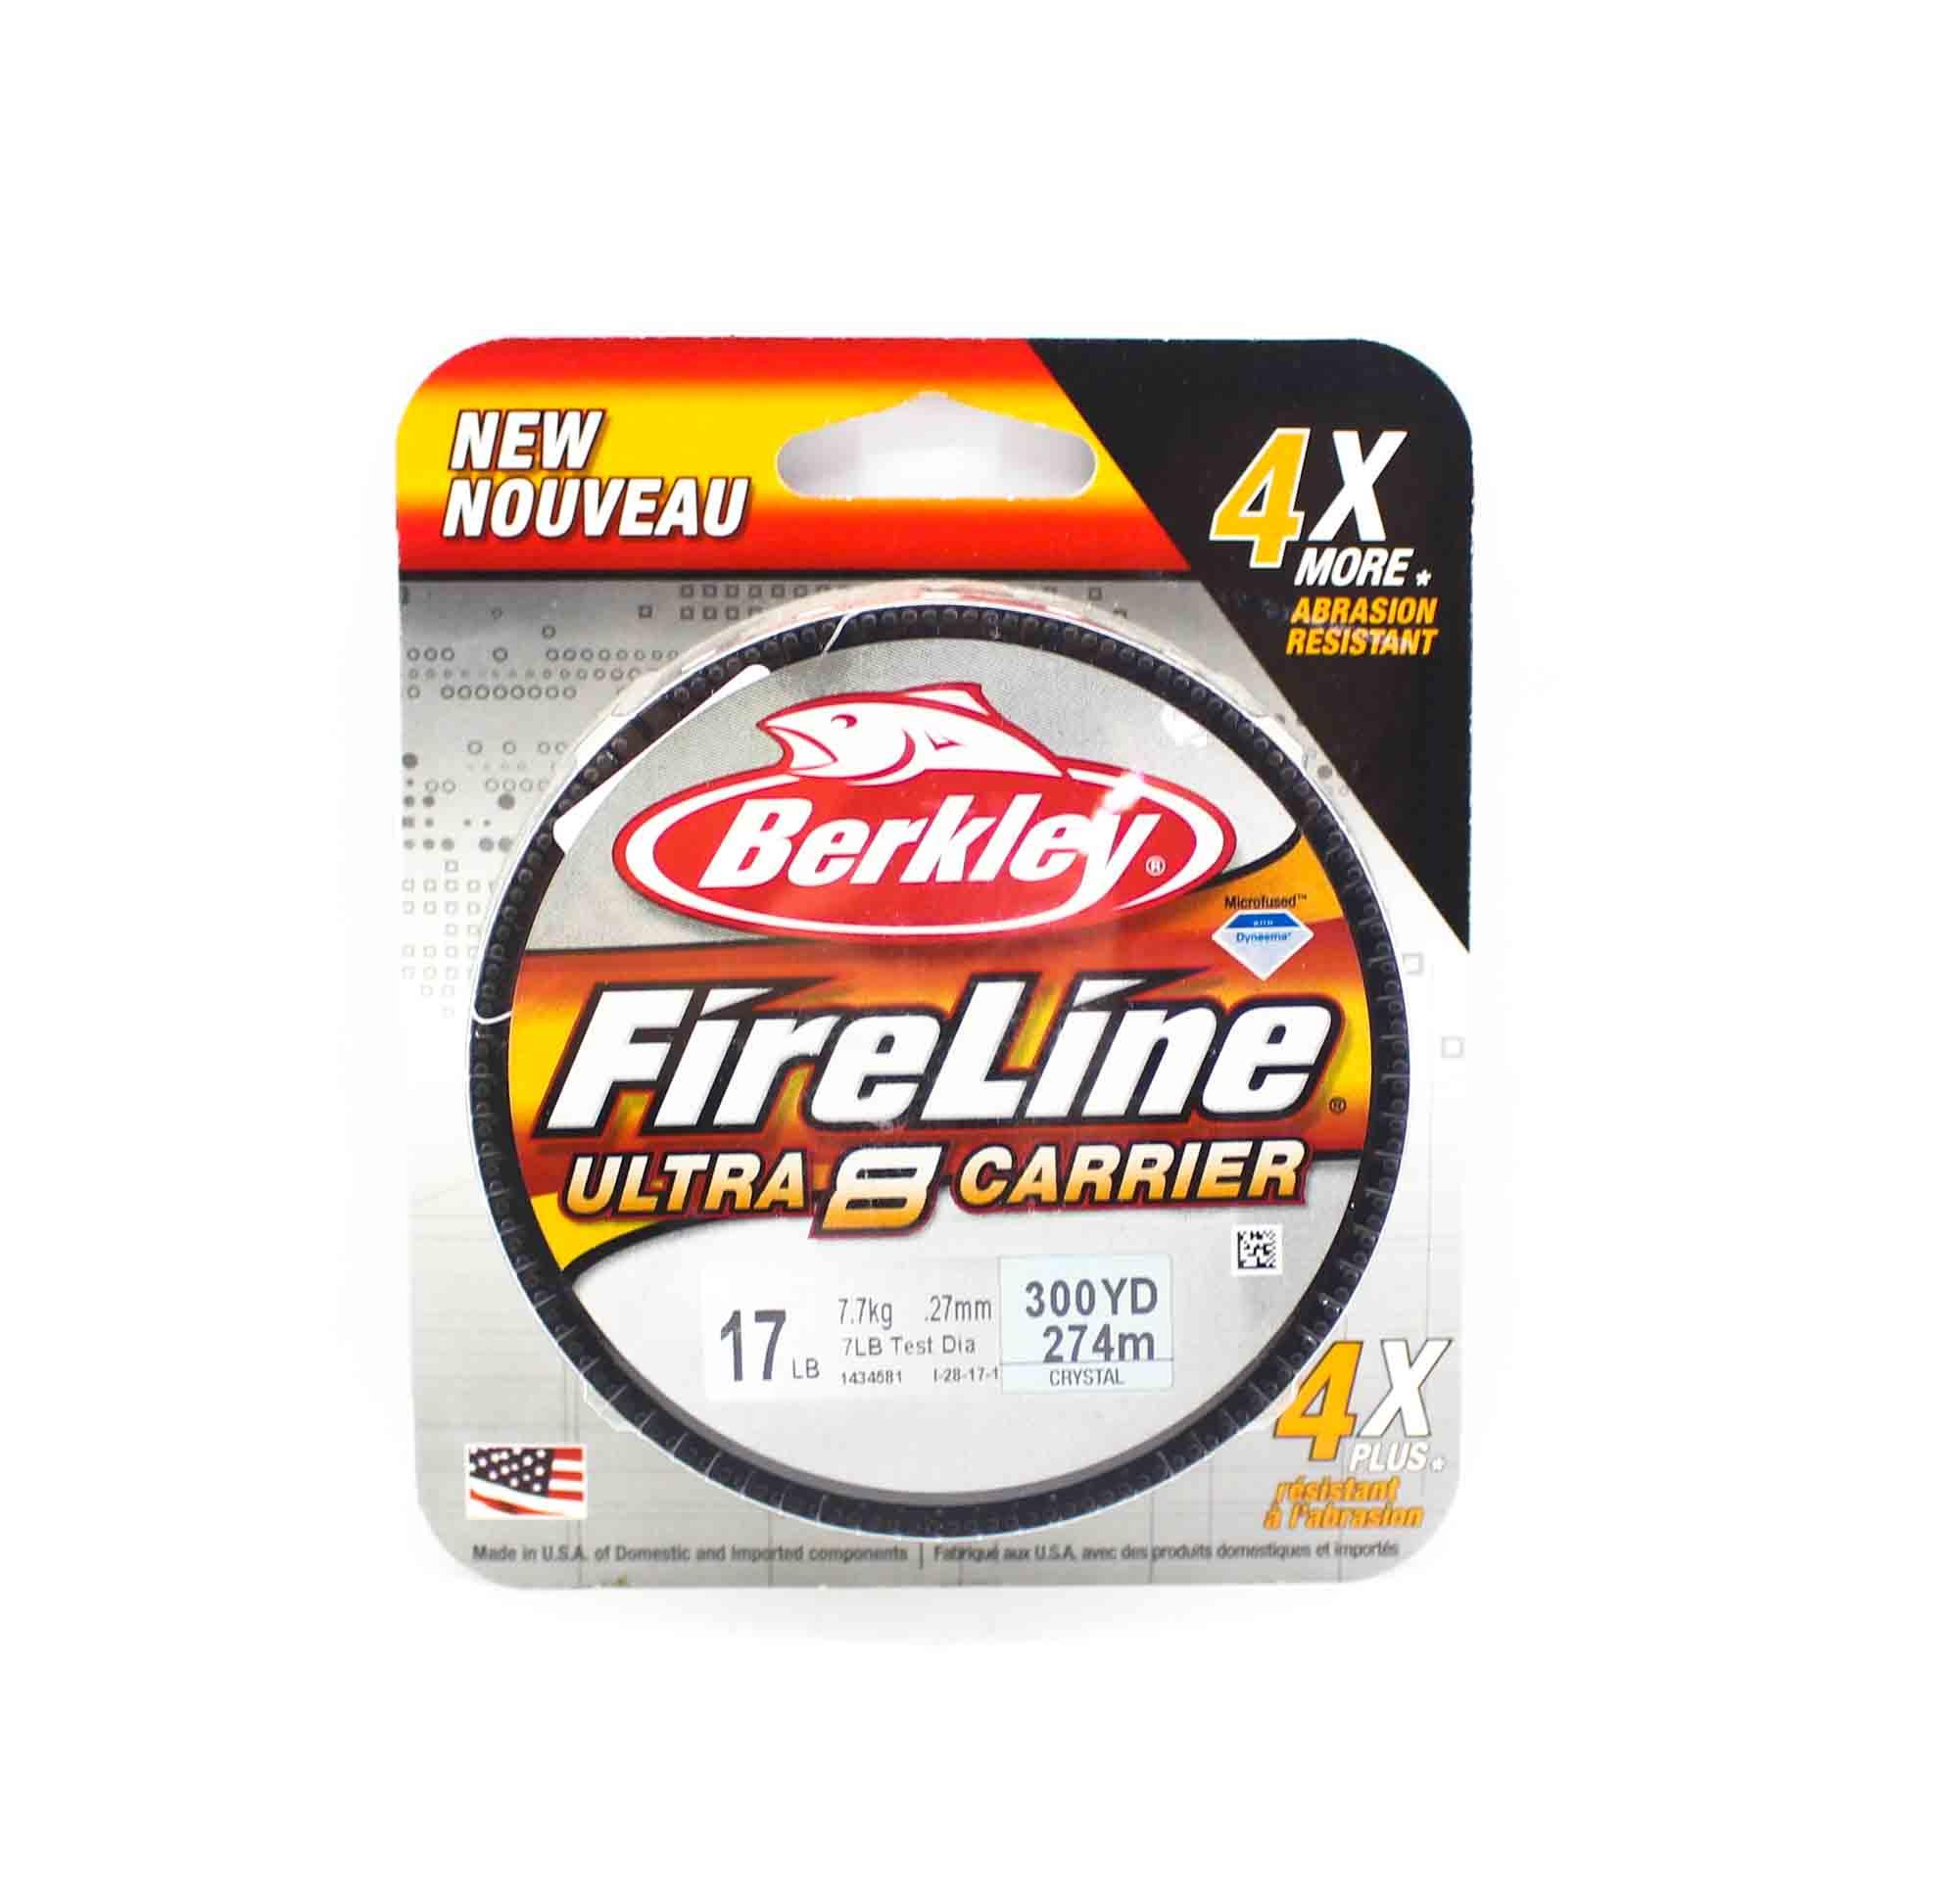 Berkley Fireline Ultra 8 Carrier 300yds 17lb White (4571)